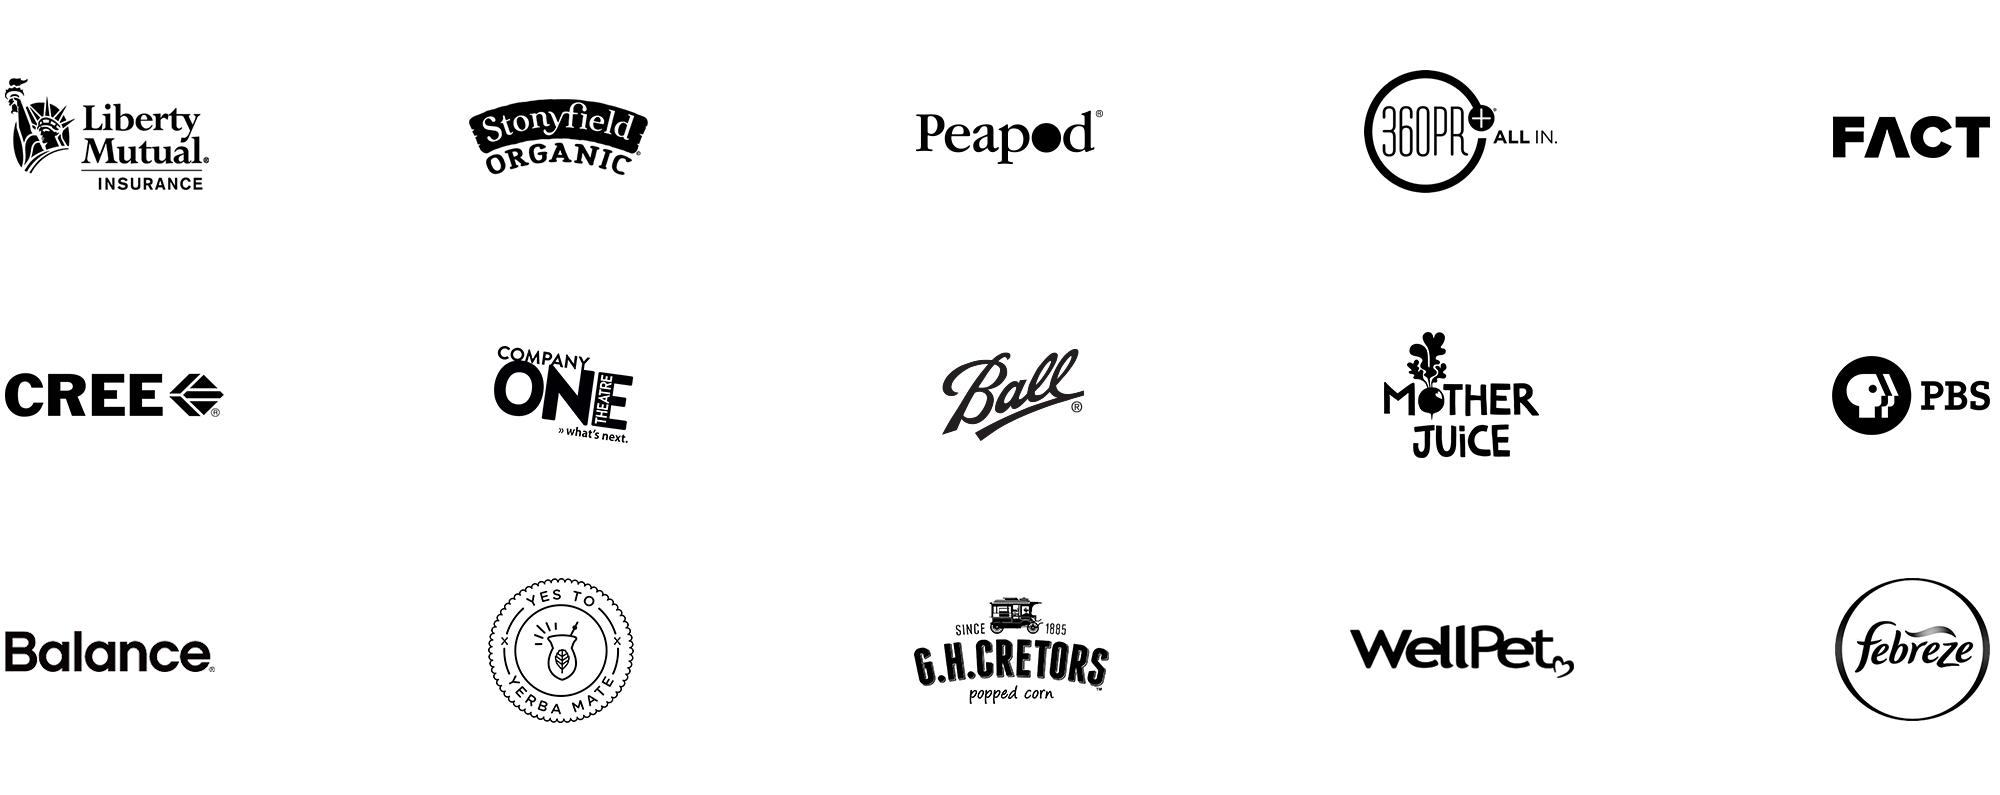 Select-Client-Logos-OPK2.png